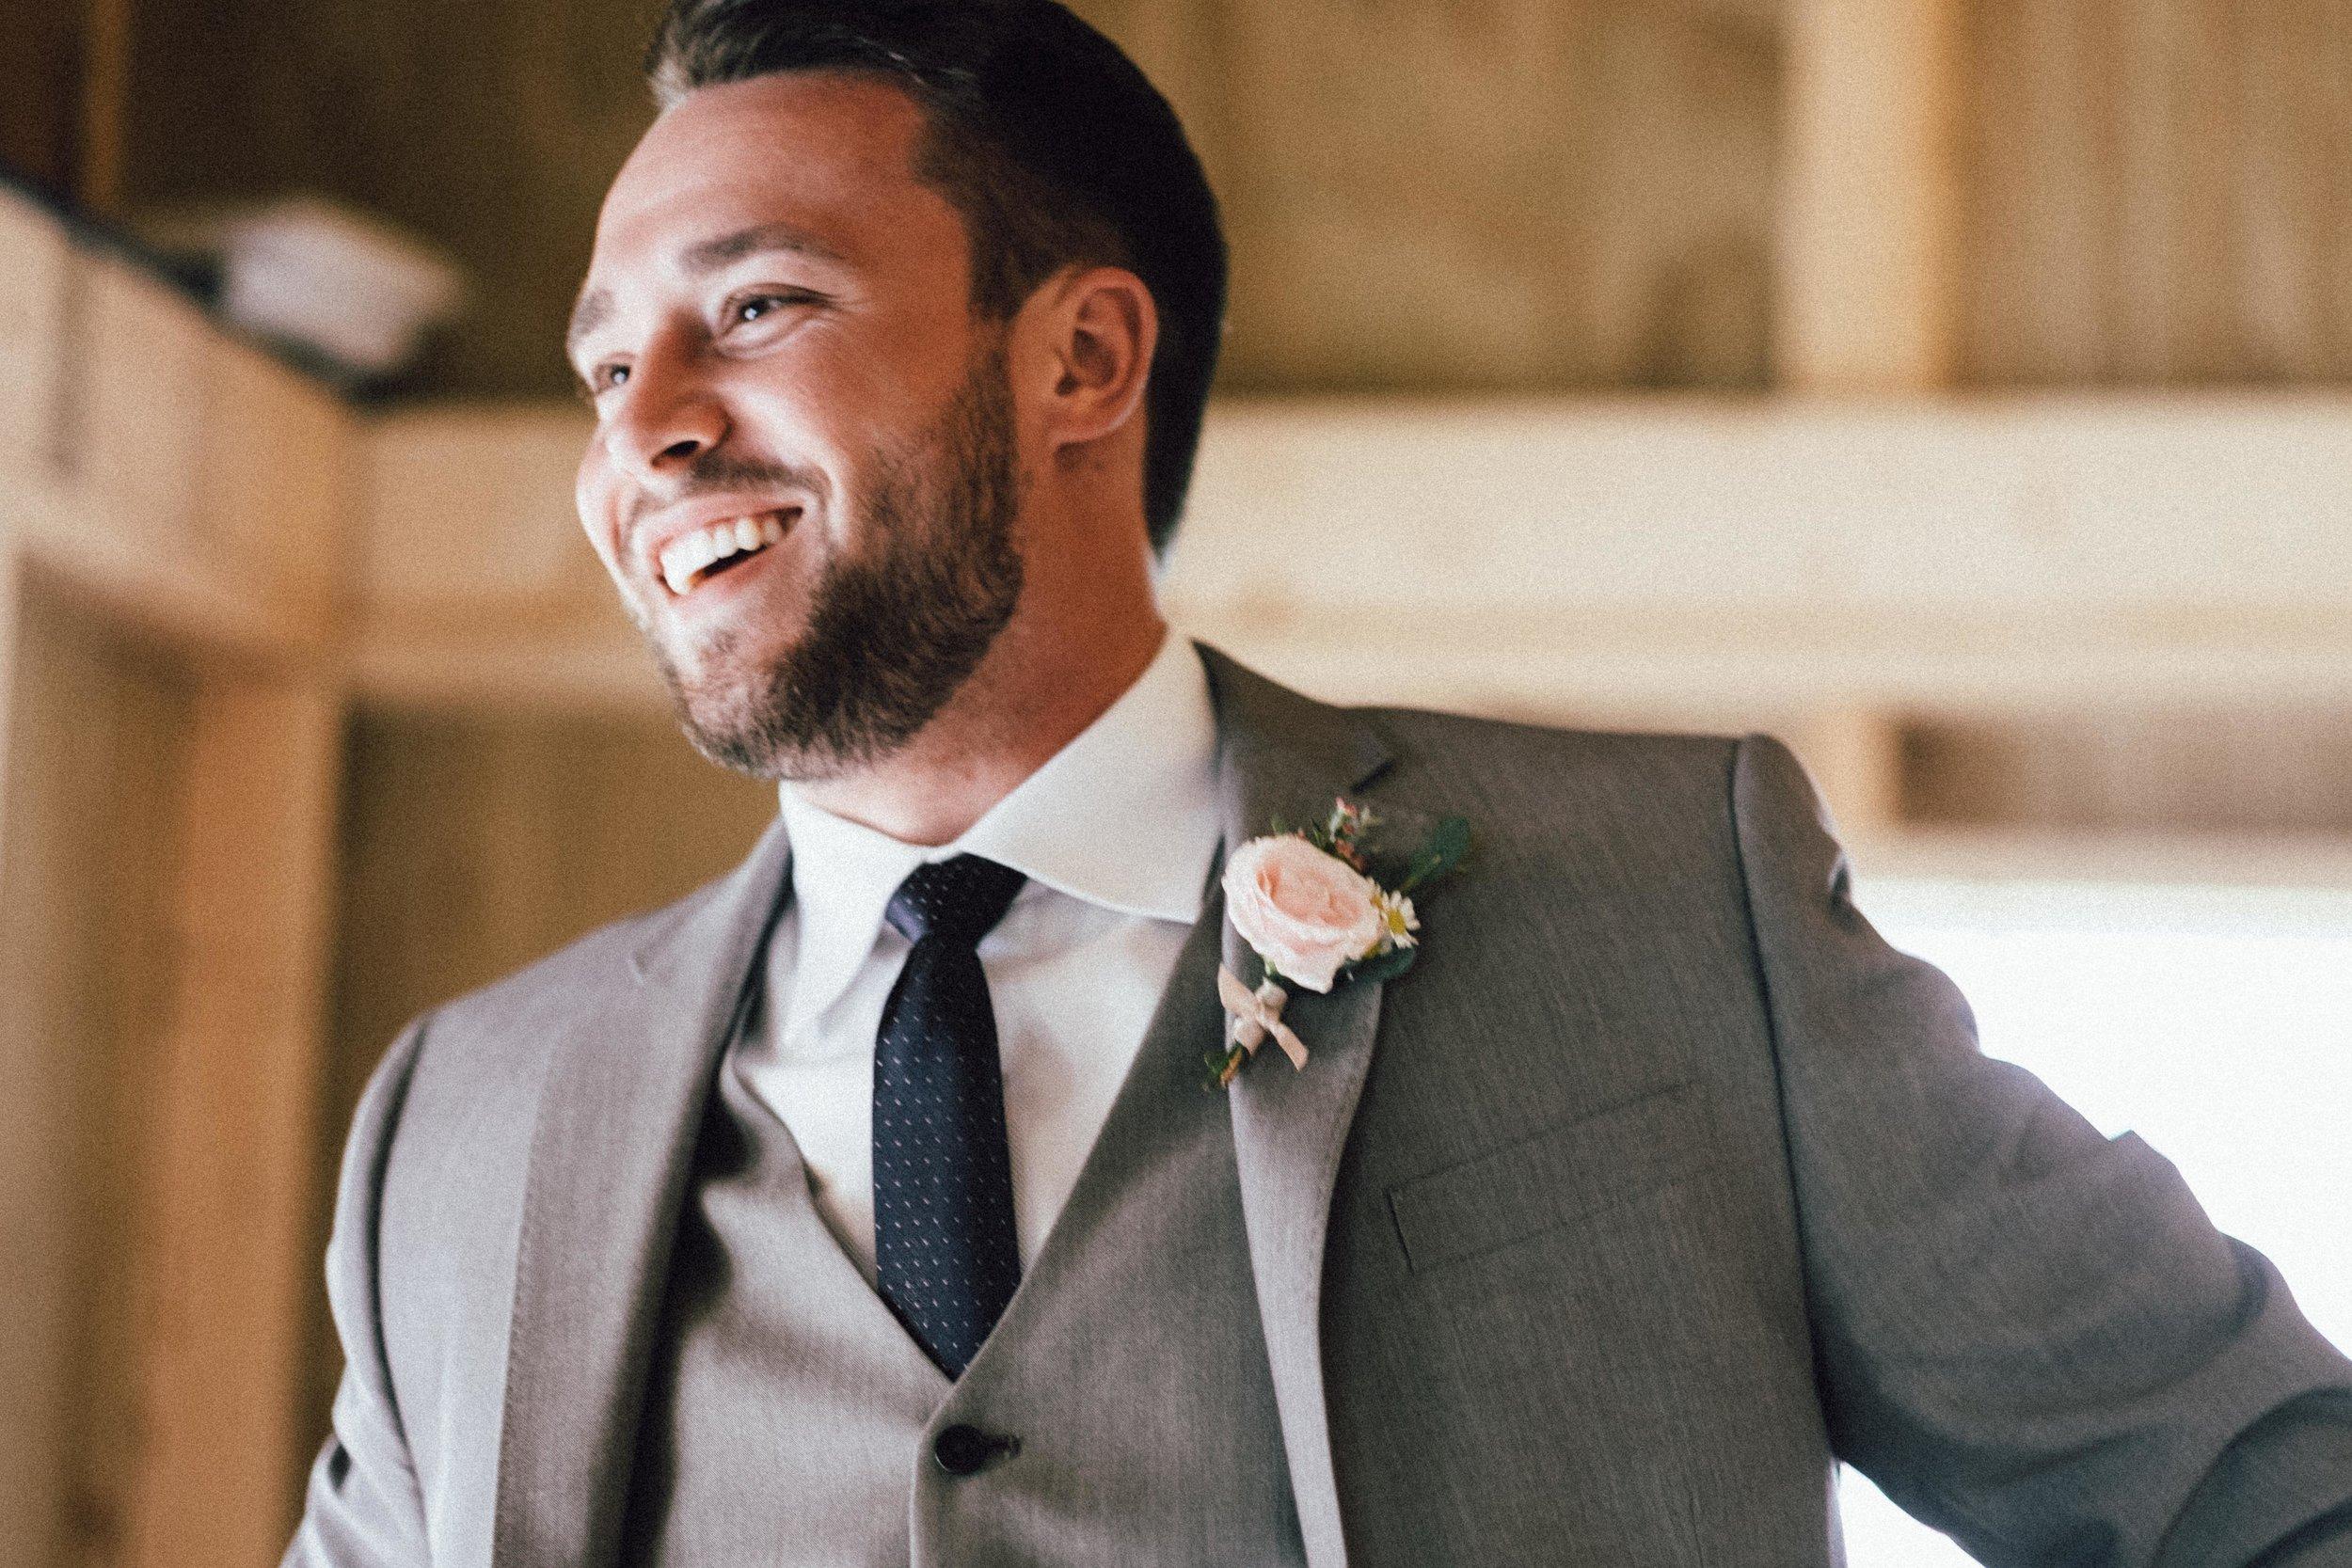 Steph-Ben-Blog-Indianapolis-Wedding-32.jpg